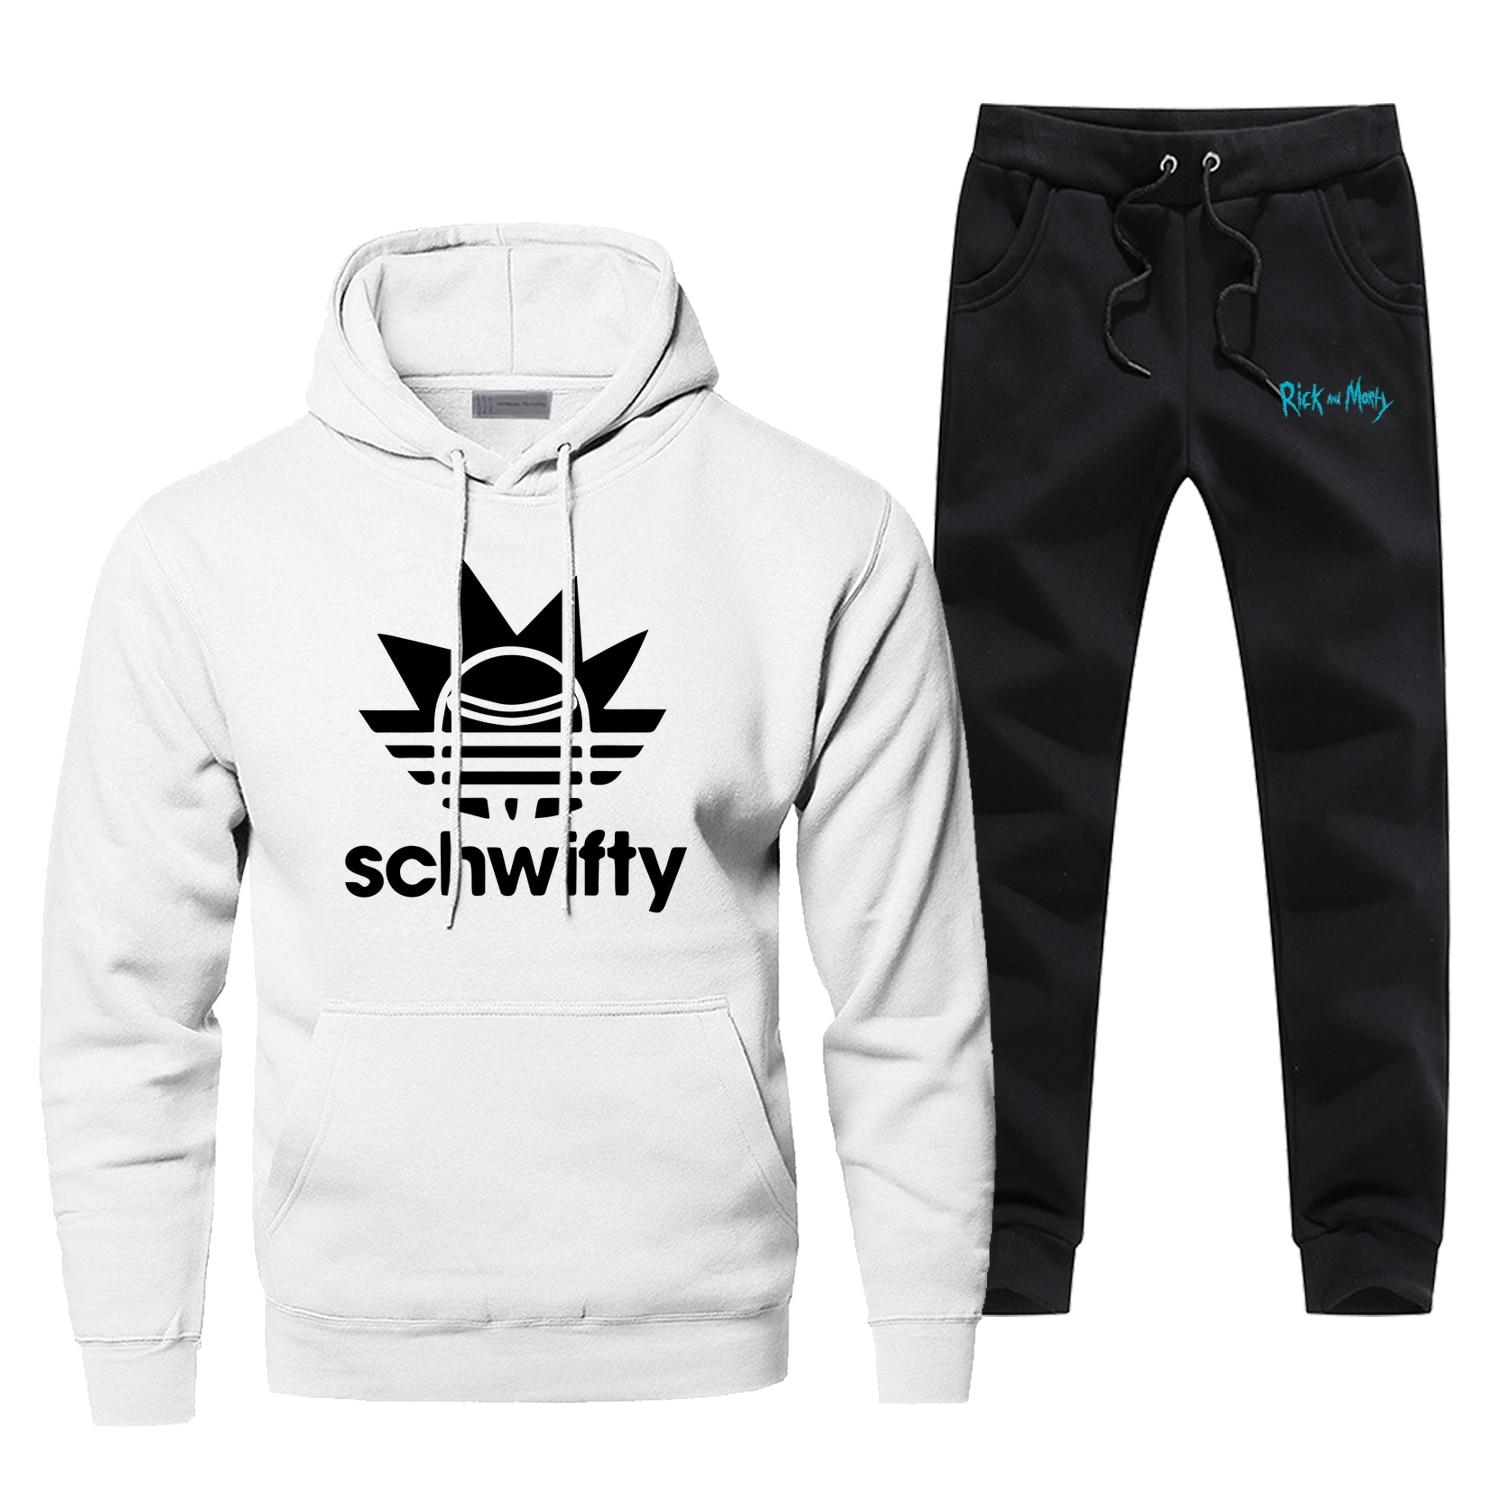 Rick And Morty Hoodies Pants Sets Men Schwifity Cartoon Suit Tracksuit 2 Piece Tops Sweatshirt Sweatpants Sportswear Autumn Set